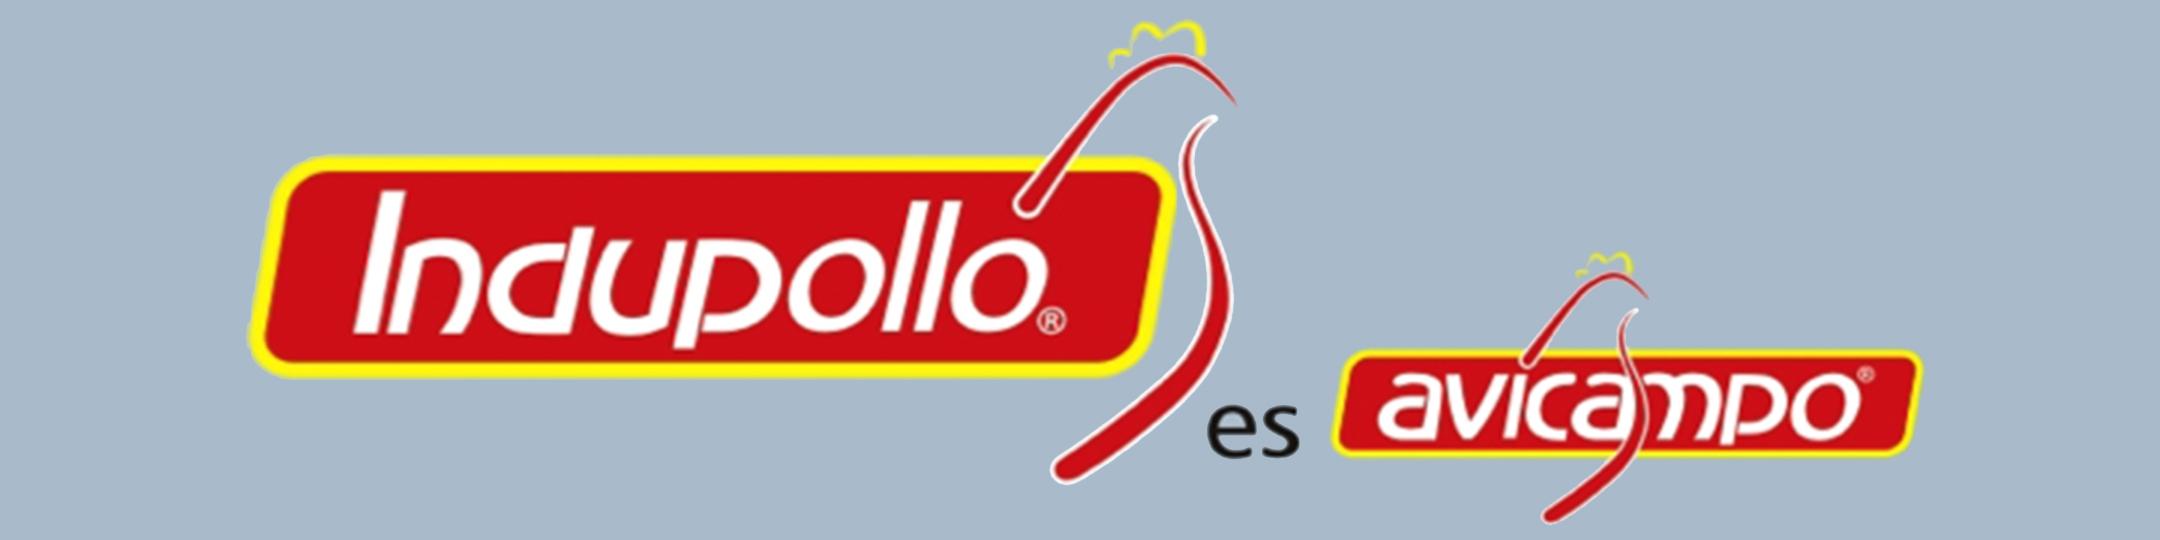 InduPollo